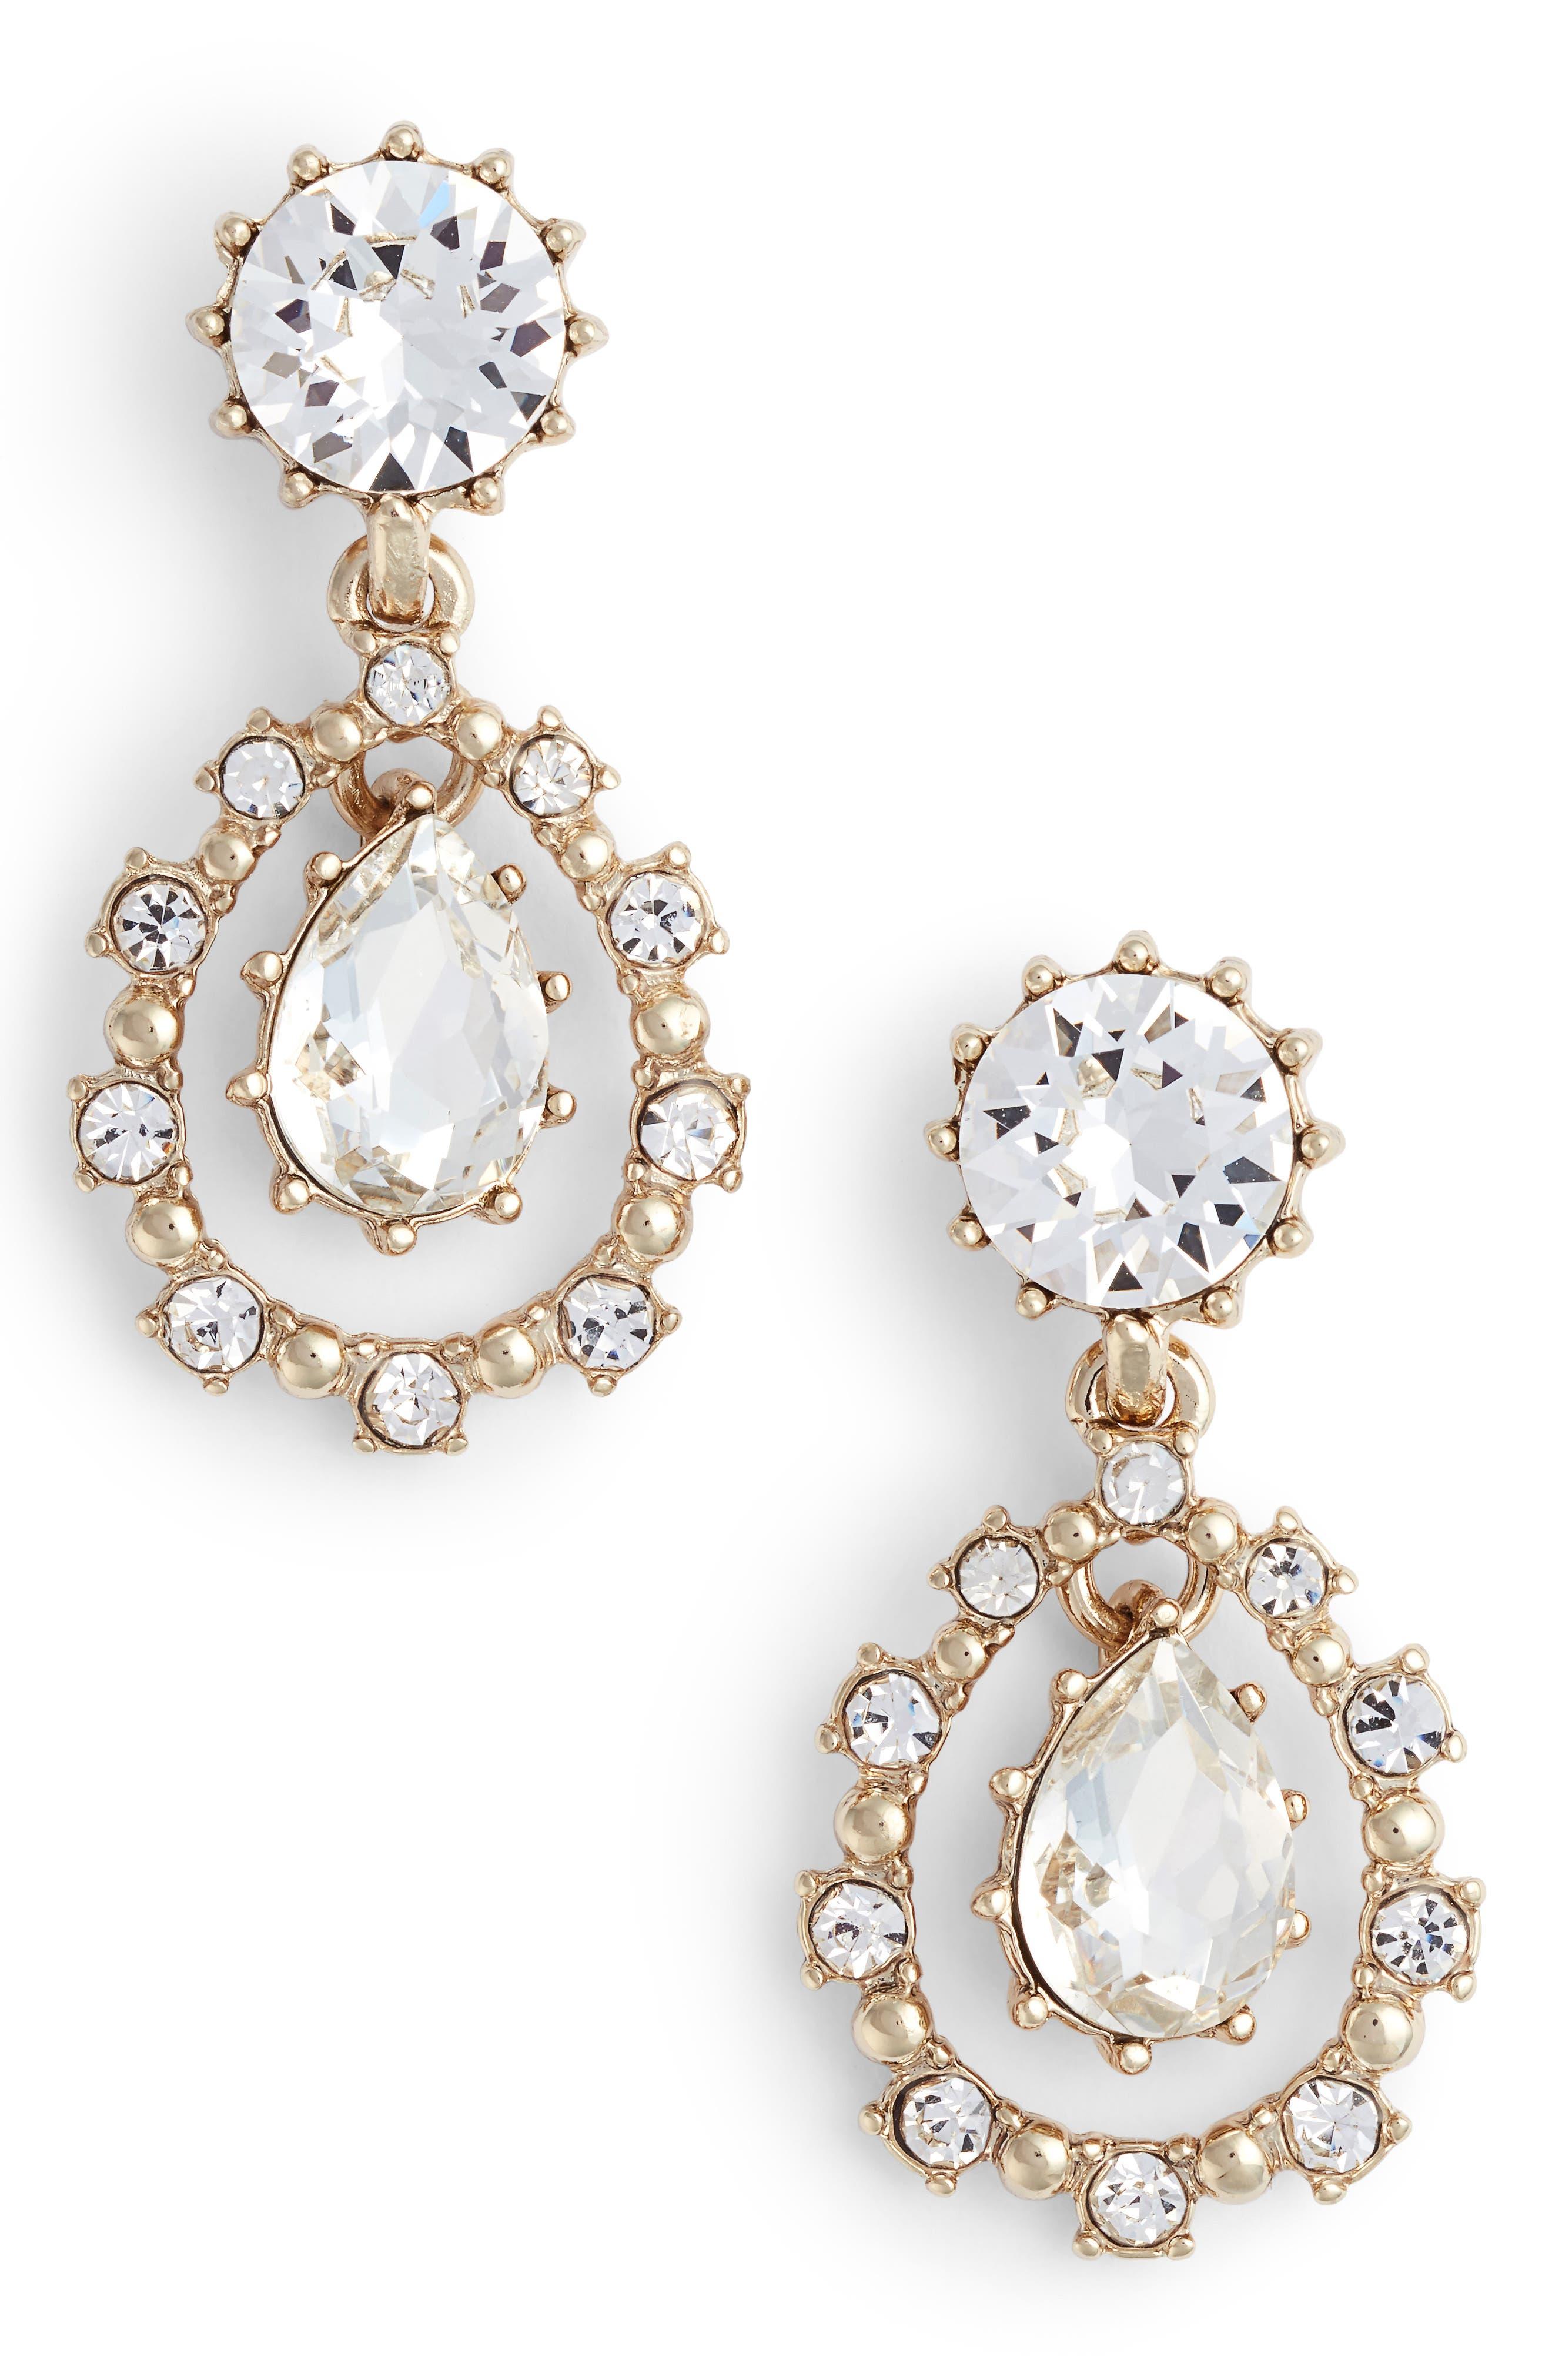 Double Drop Crystal Earrings,                             Main thumbnail 1, color,                             Gold/ Crystal